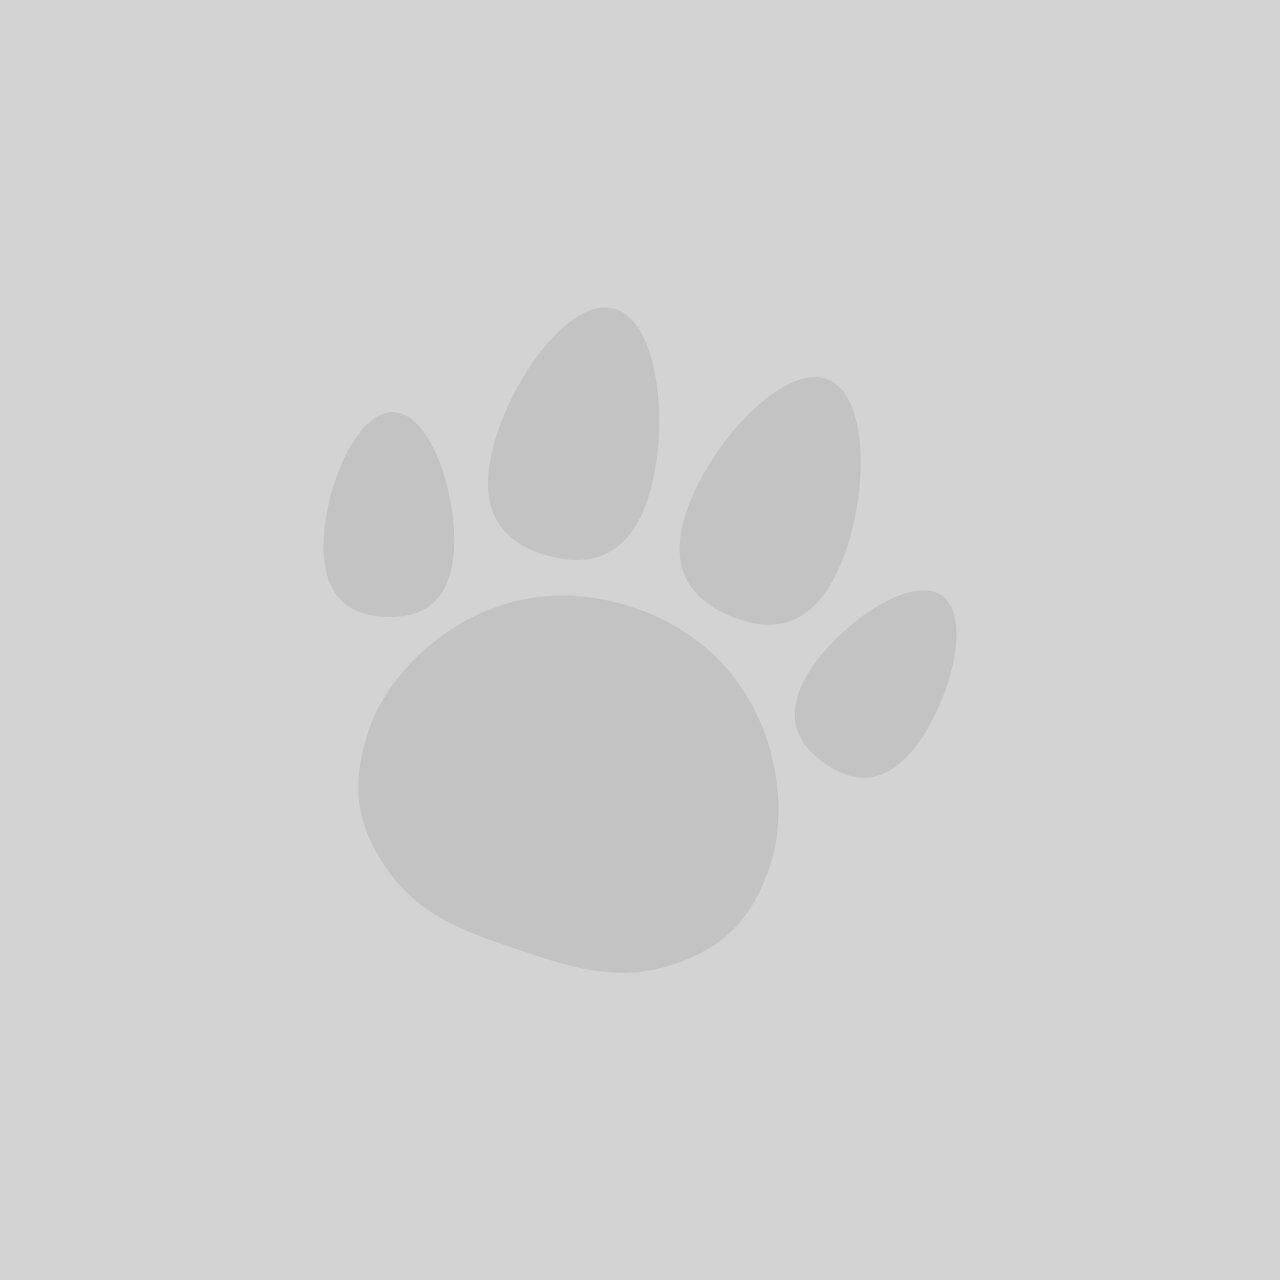 Iams Adult Dry Dog Food Small/Medium Chicken 12kg